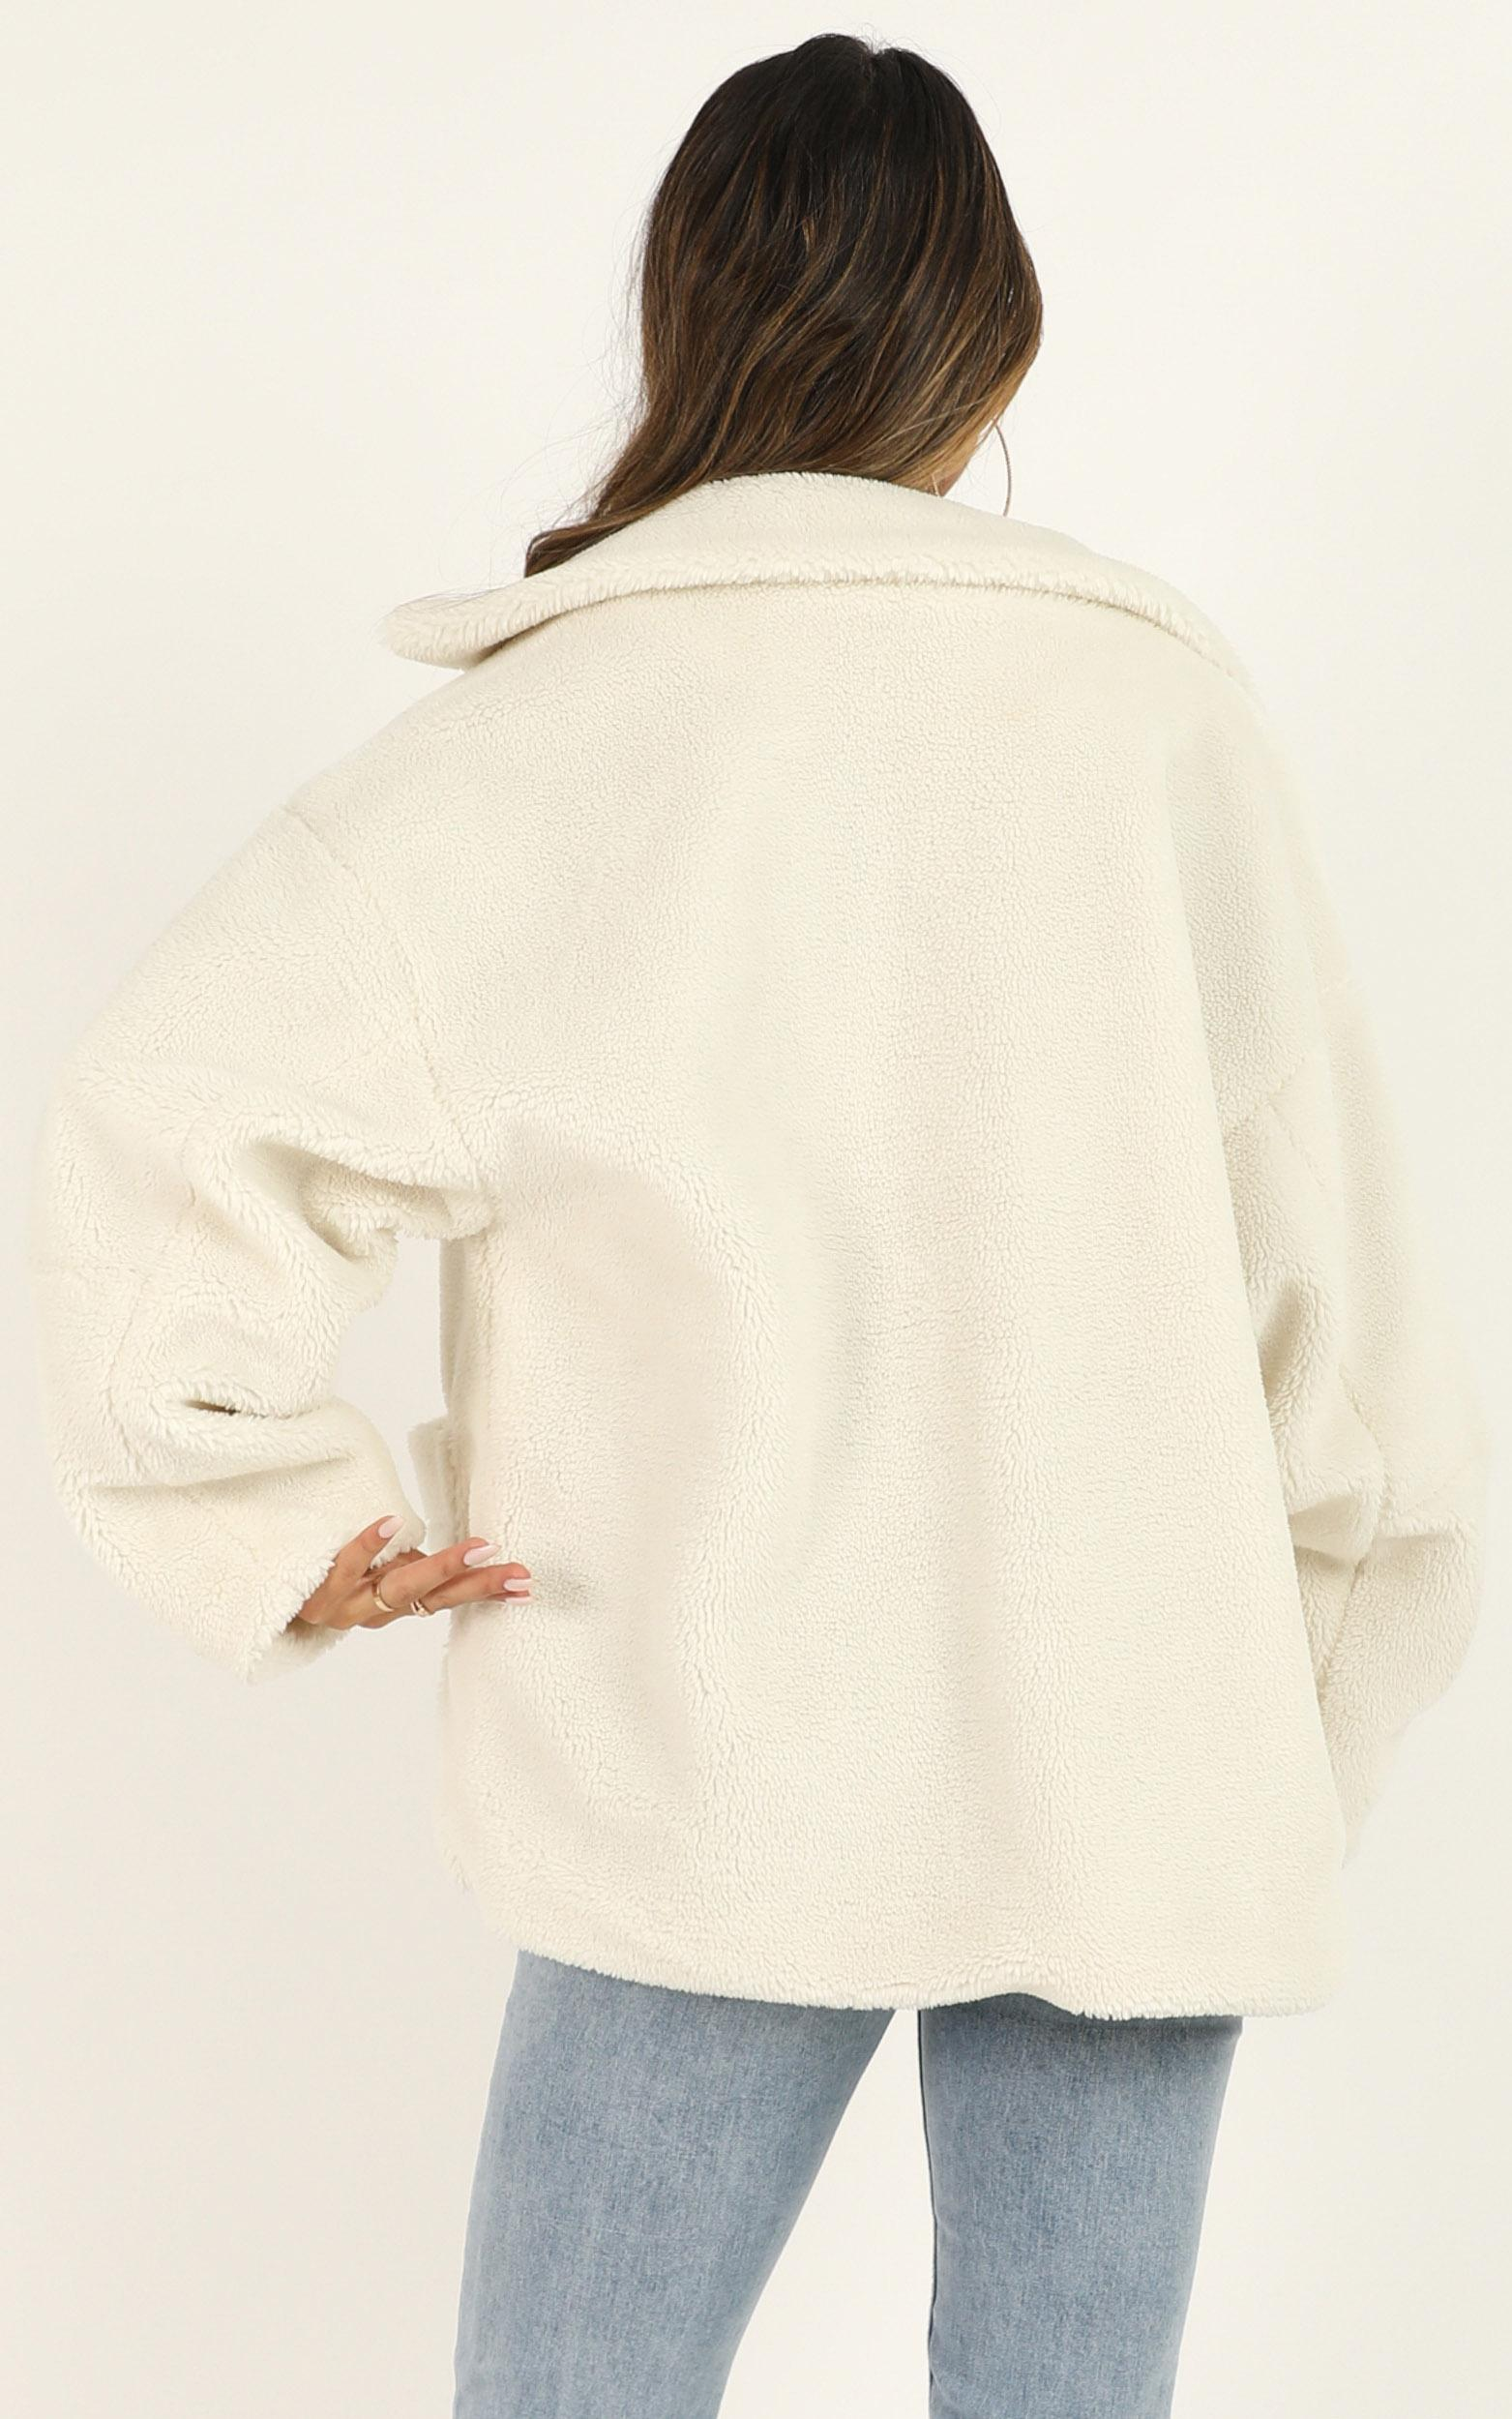 Forever Lasting Jacket in cream - 20 (XXXXL), Cream, hi-res image number null